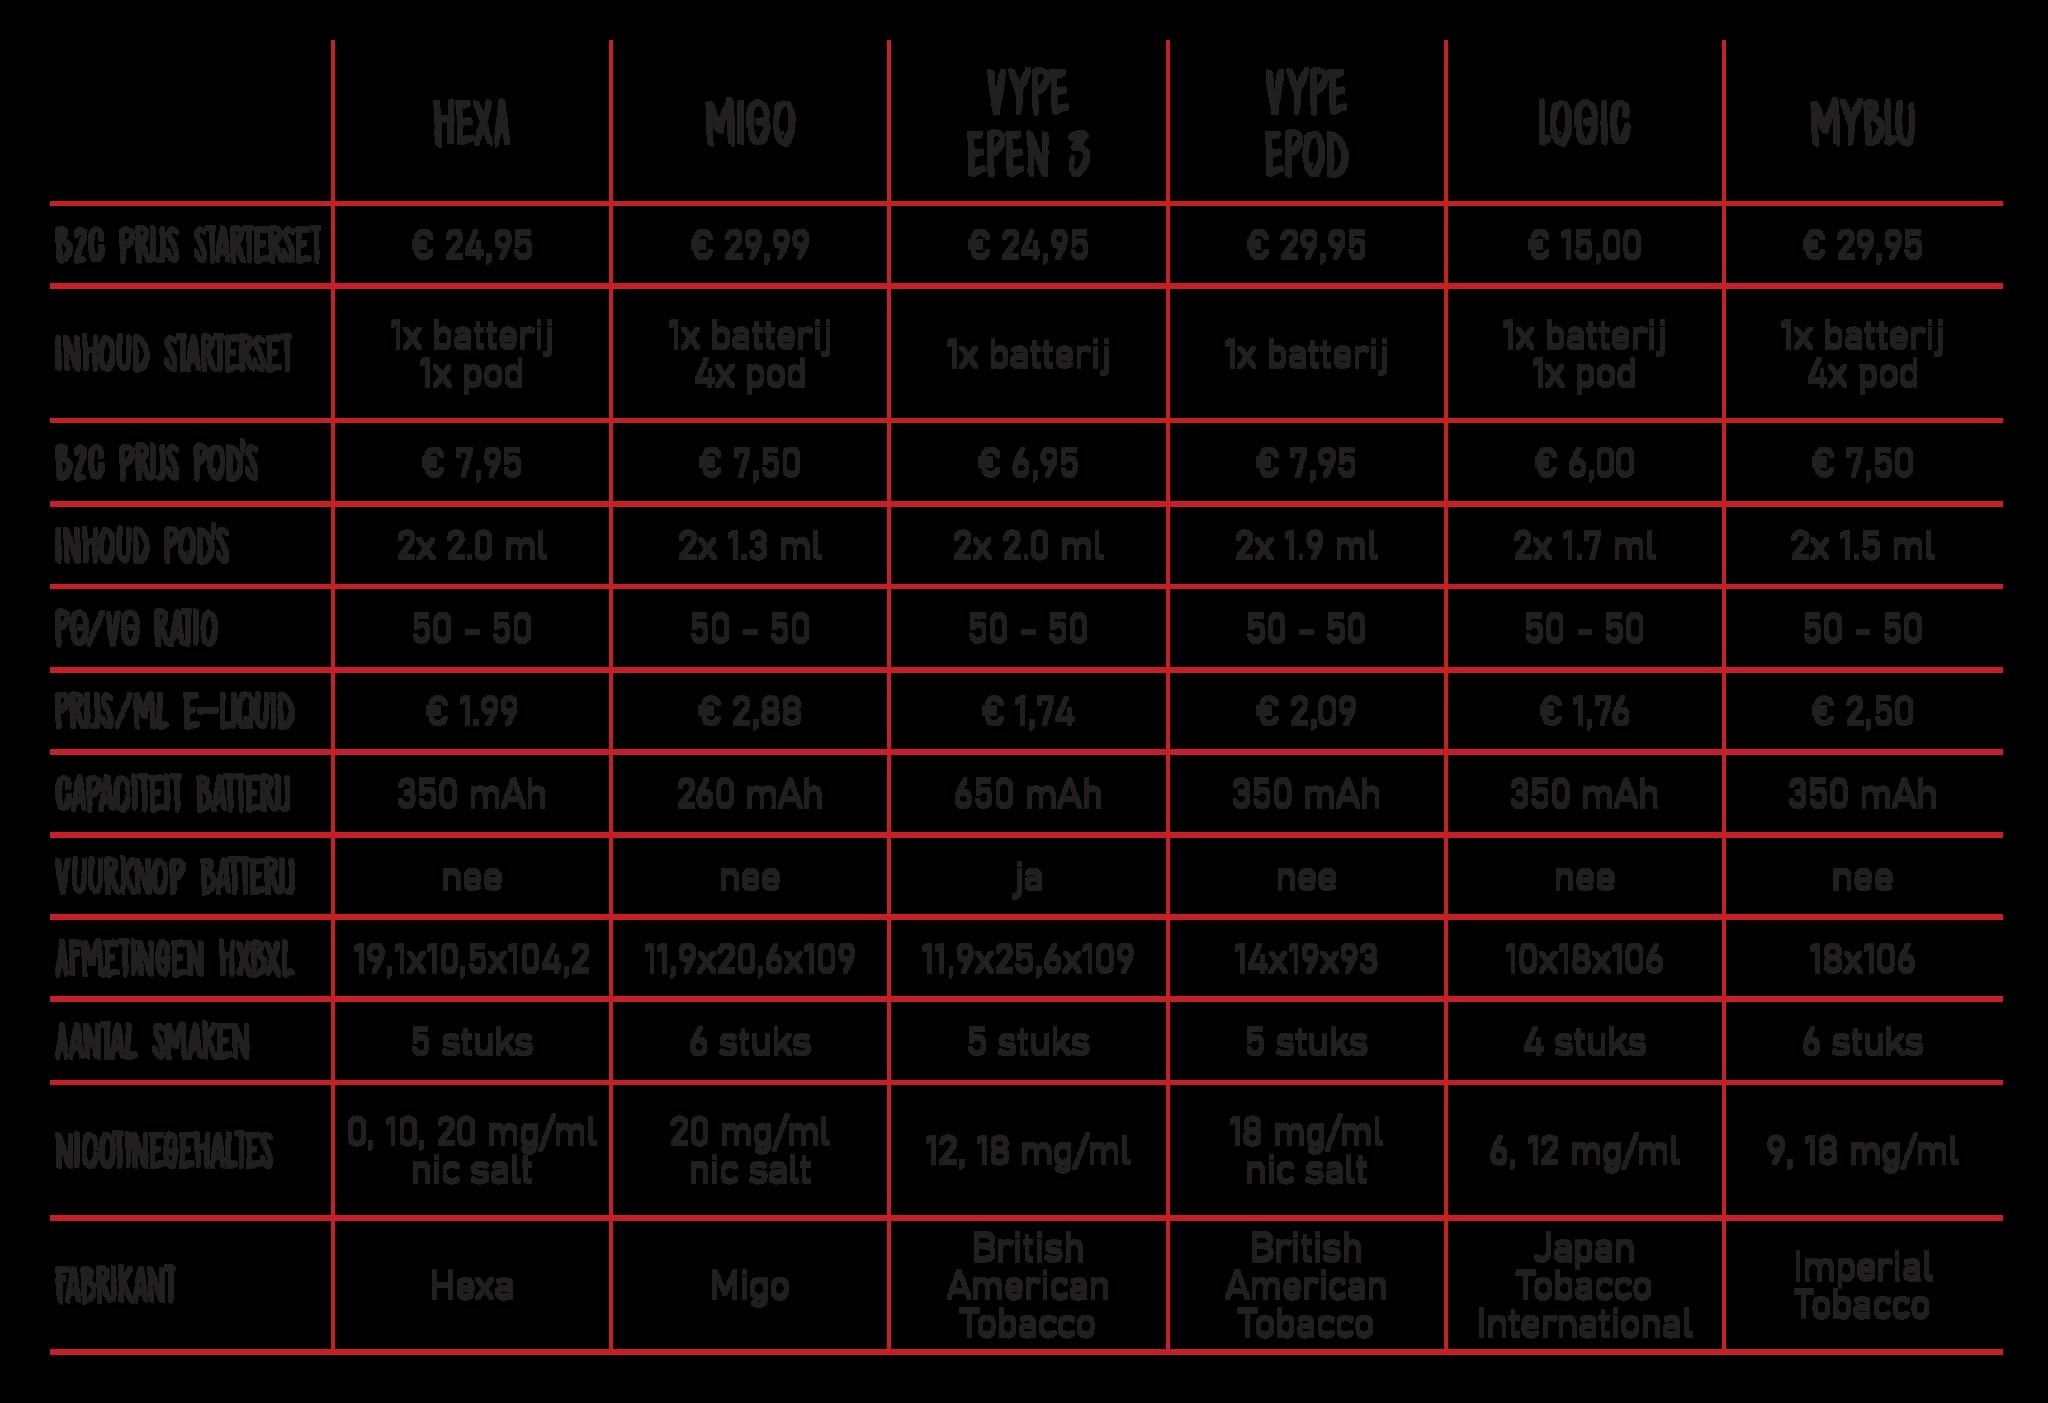 Vape POD informatie Vype MyBlu Logic Migo Hexa tabel